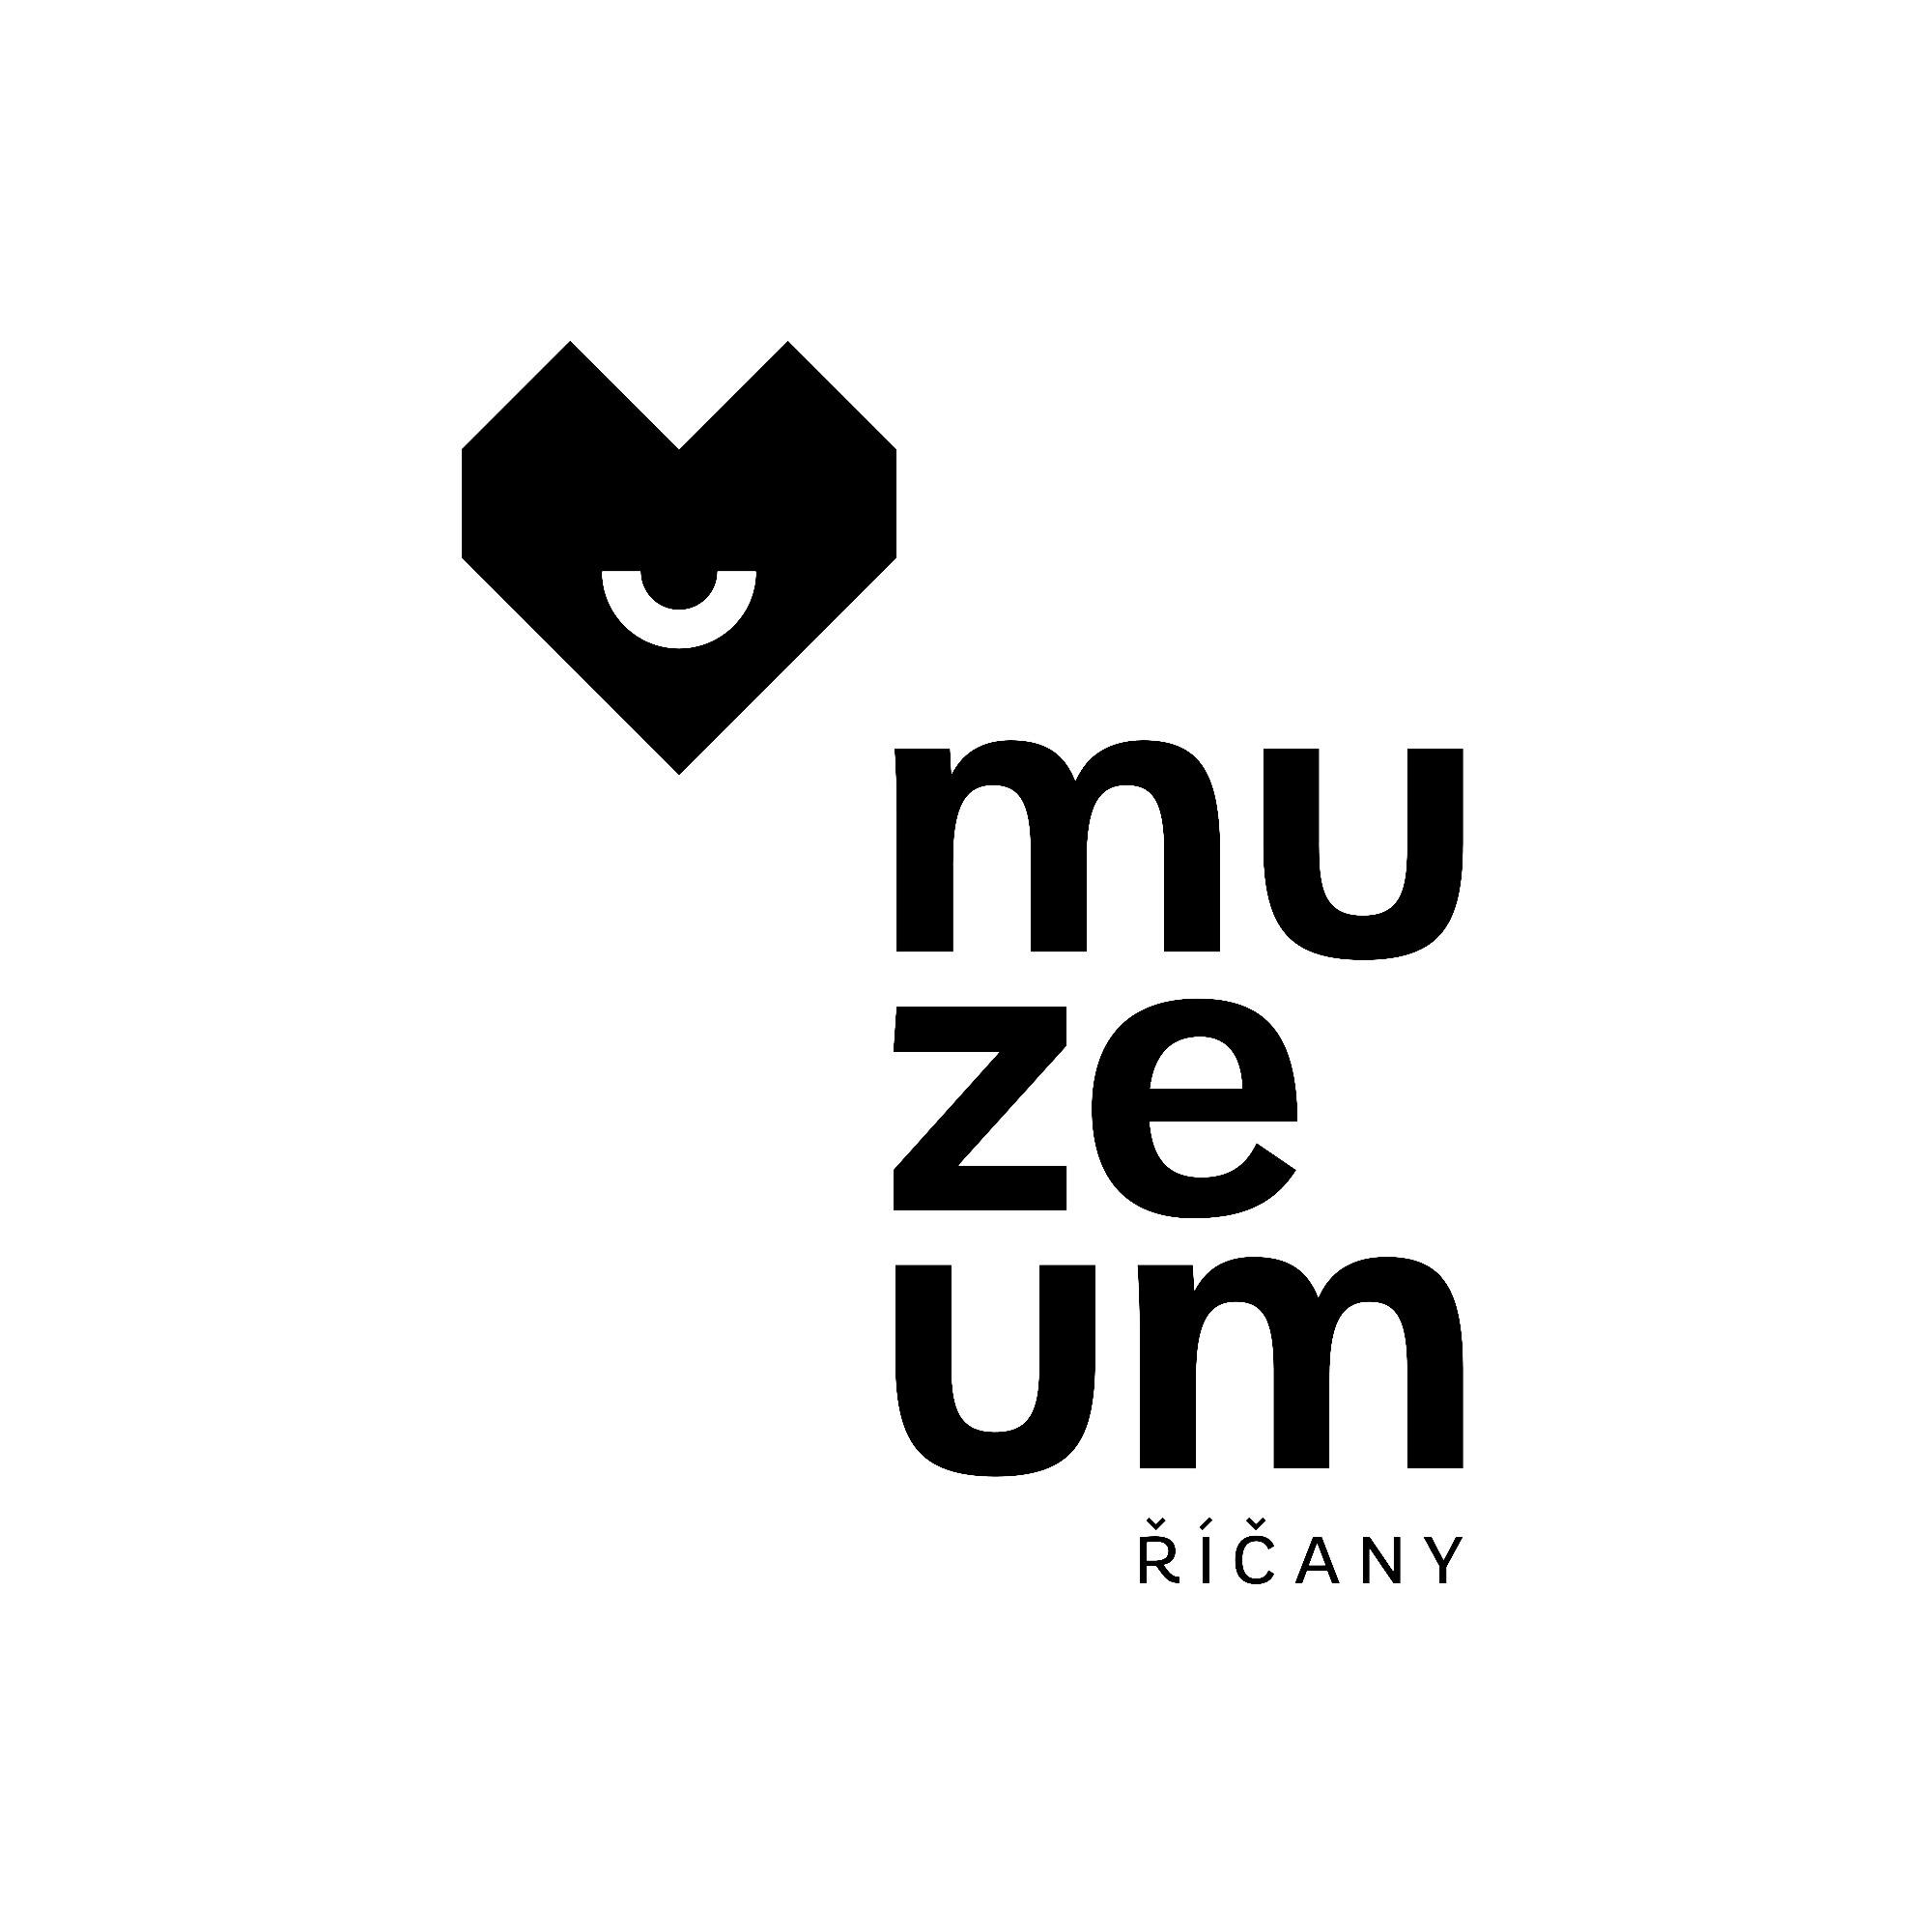 logo muzeum říčany